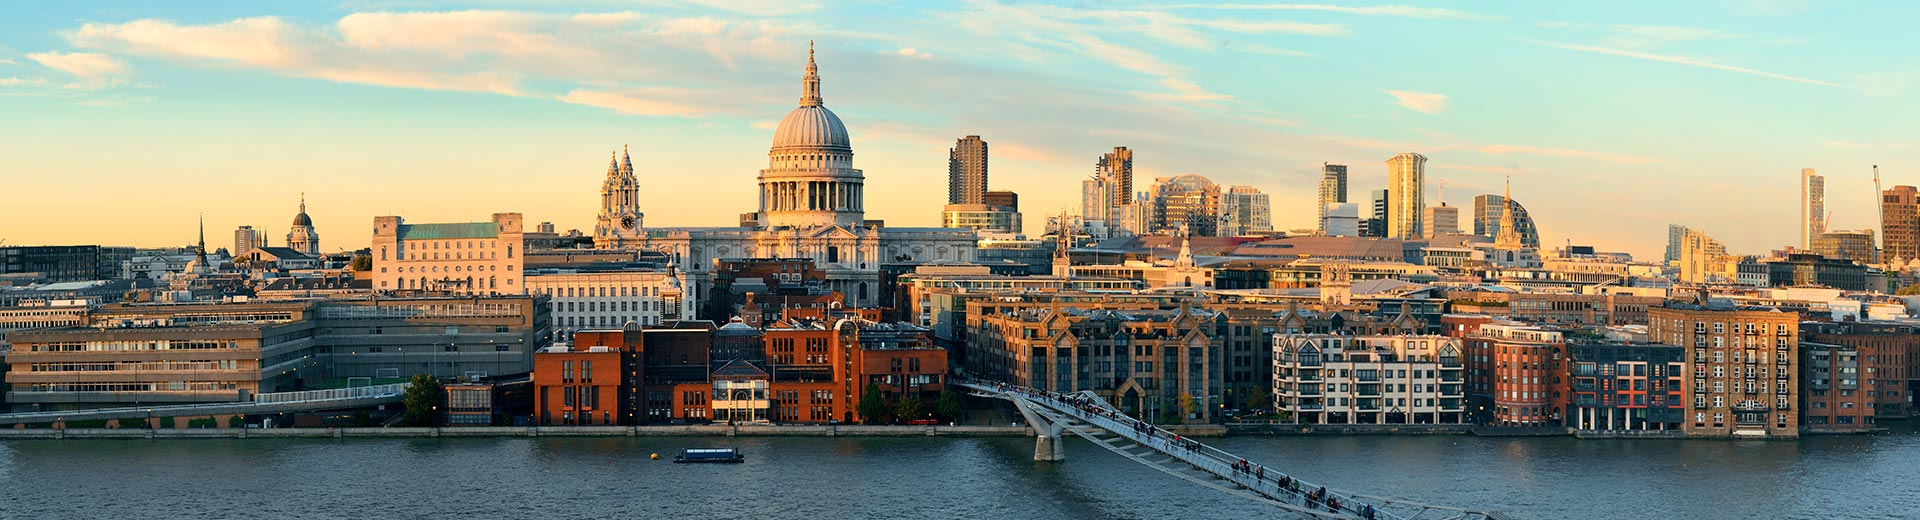 Escapade à Londres